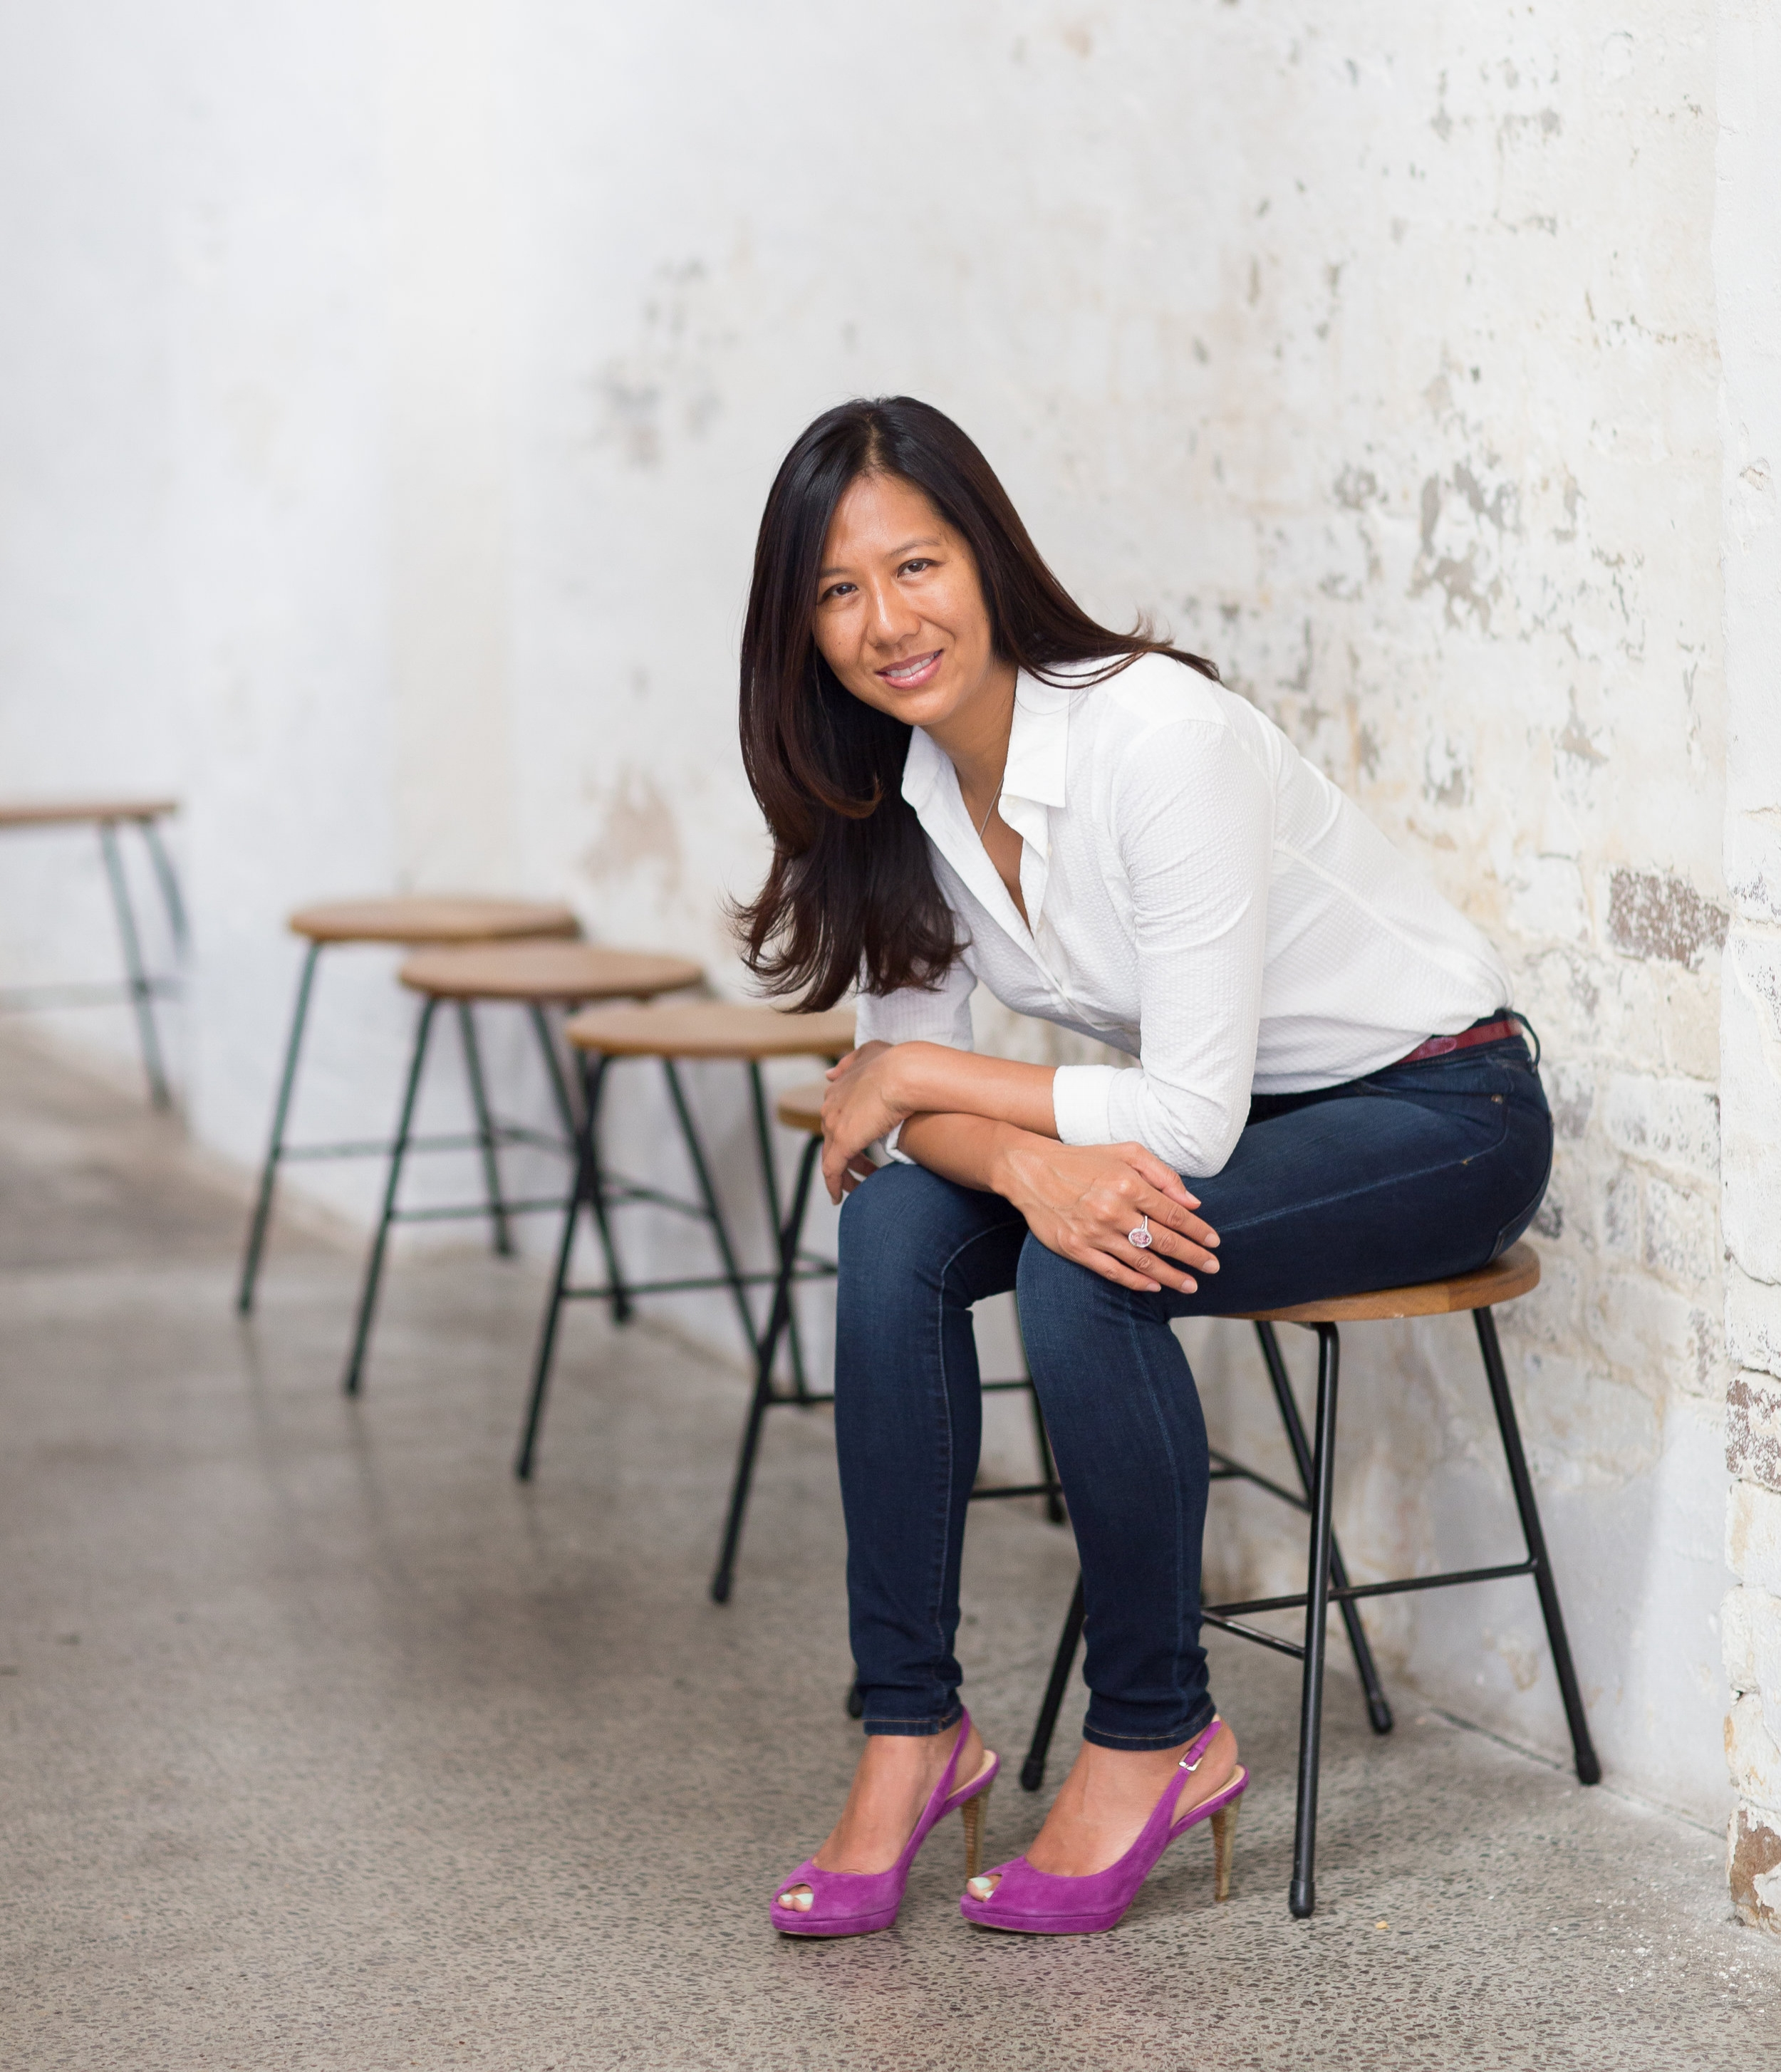 Margie Kwan